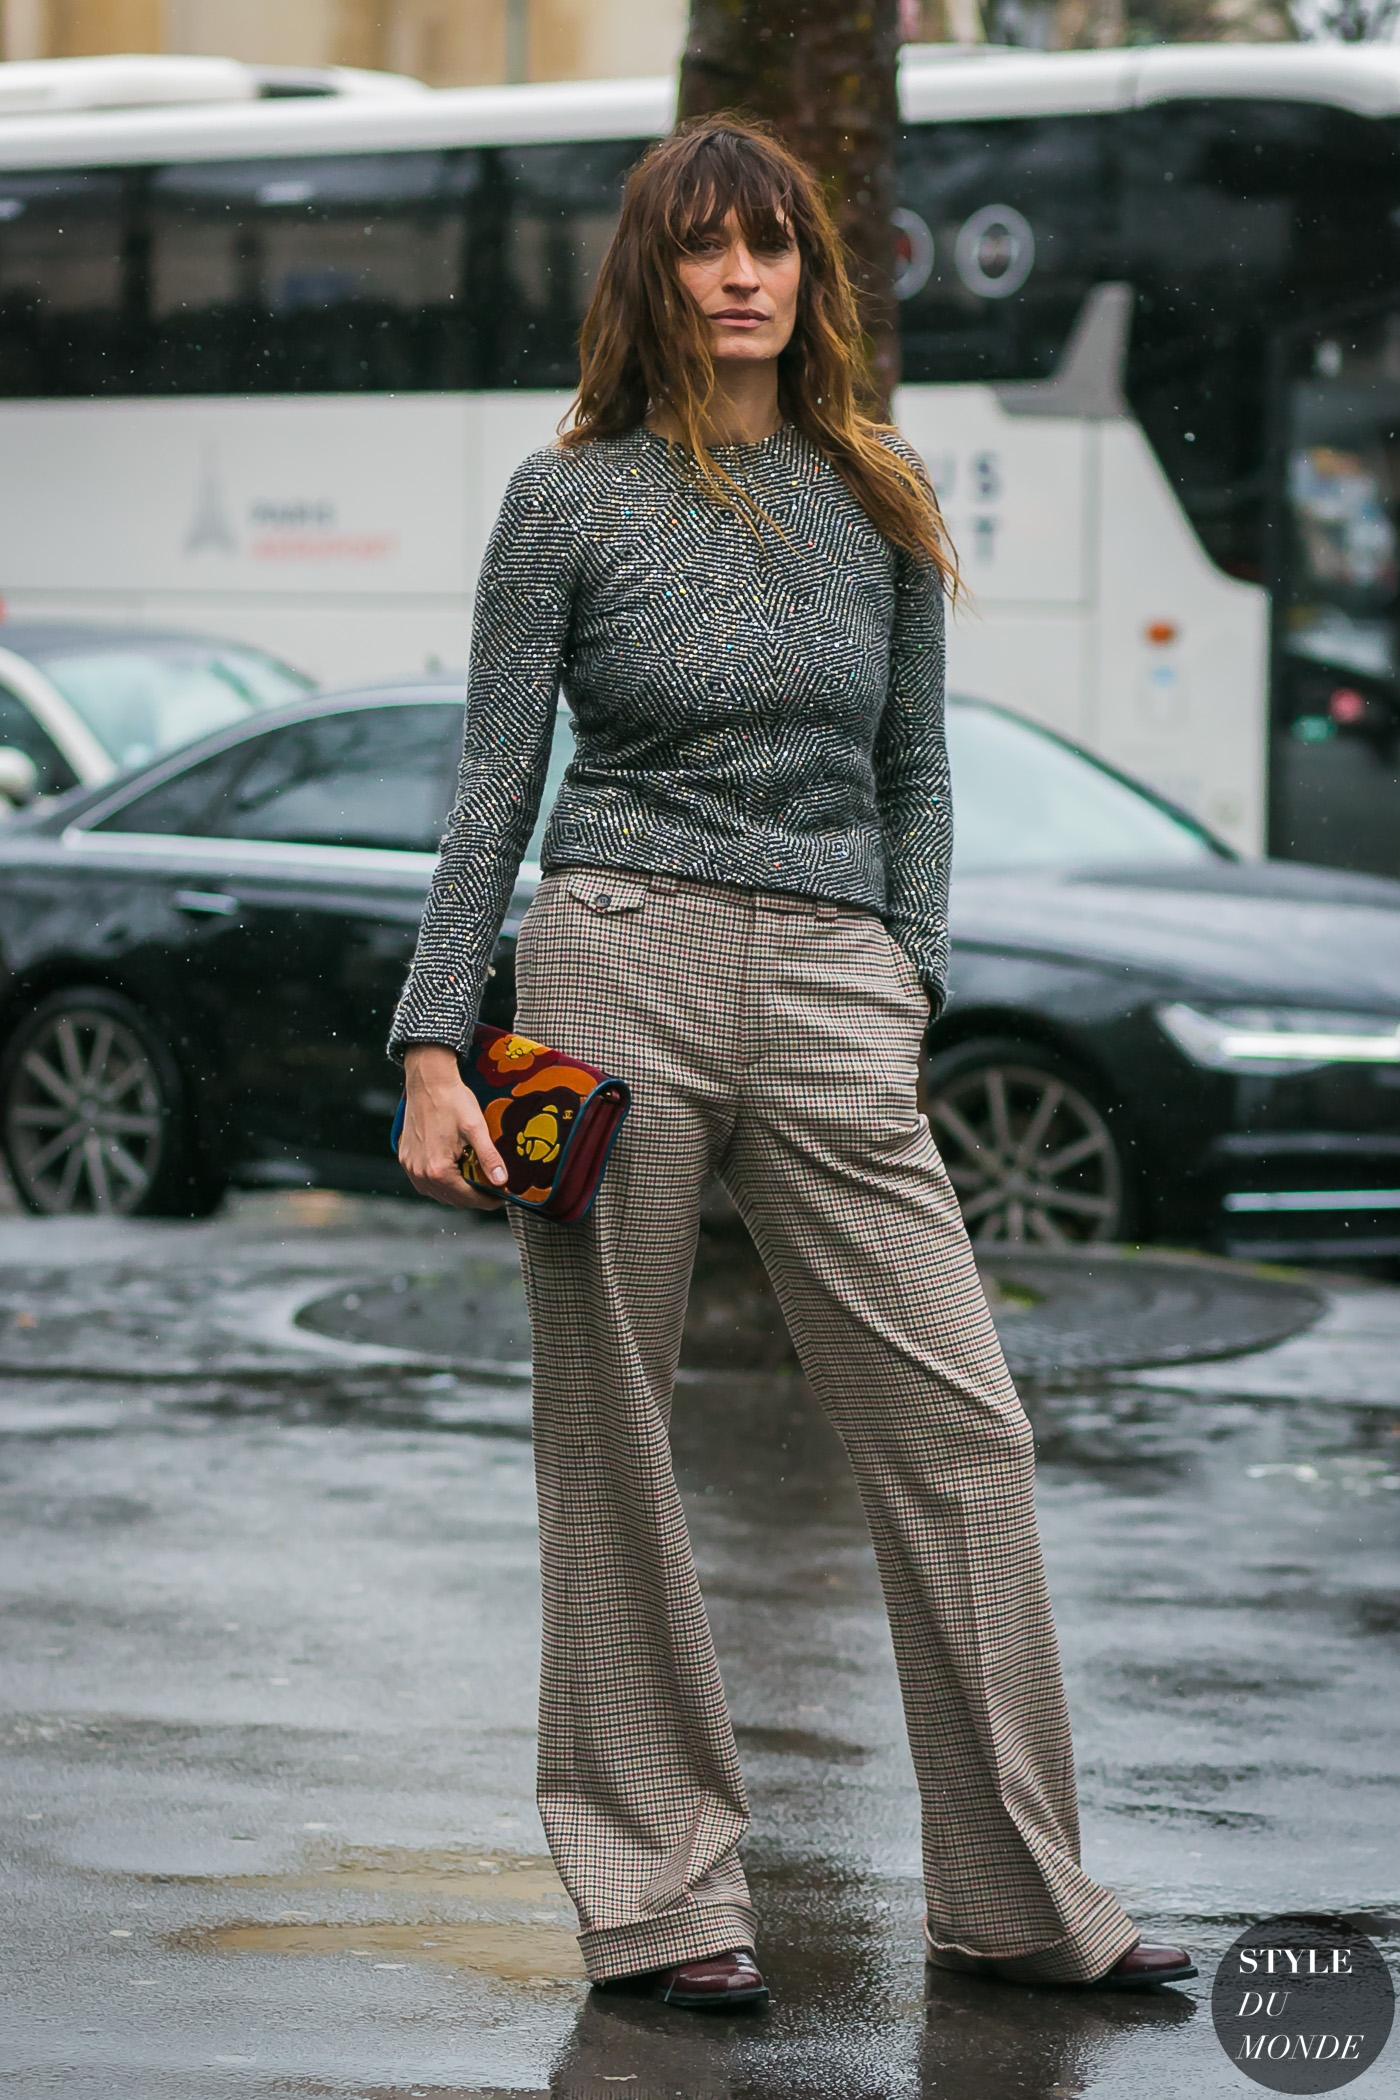 Caroline de Maigret by STYLEDUMONDE Street Style Fashion Photography